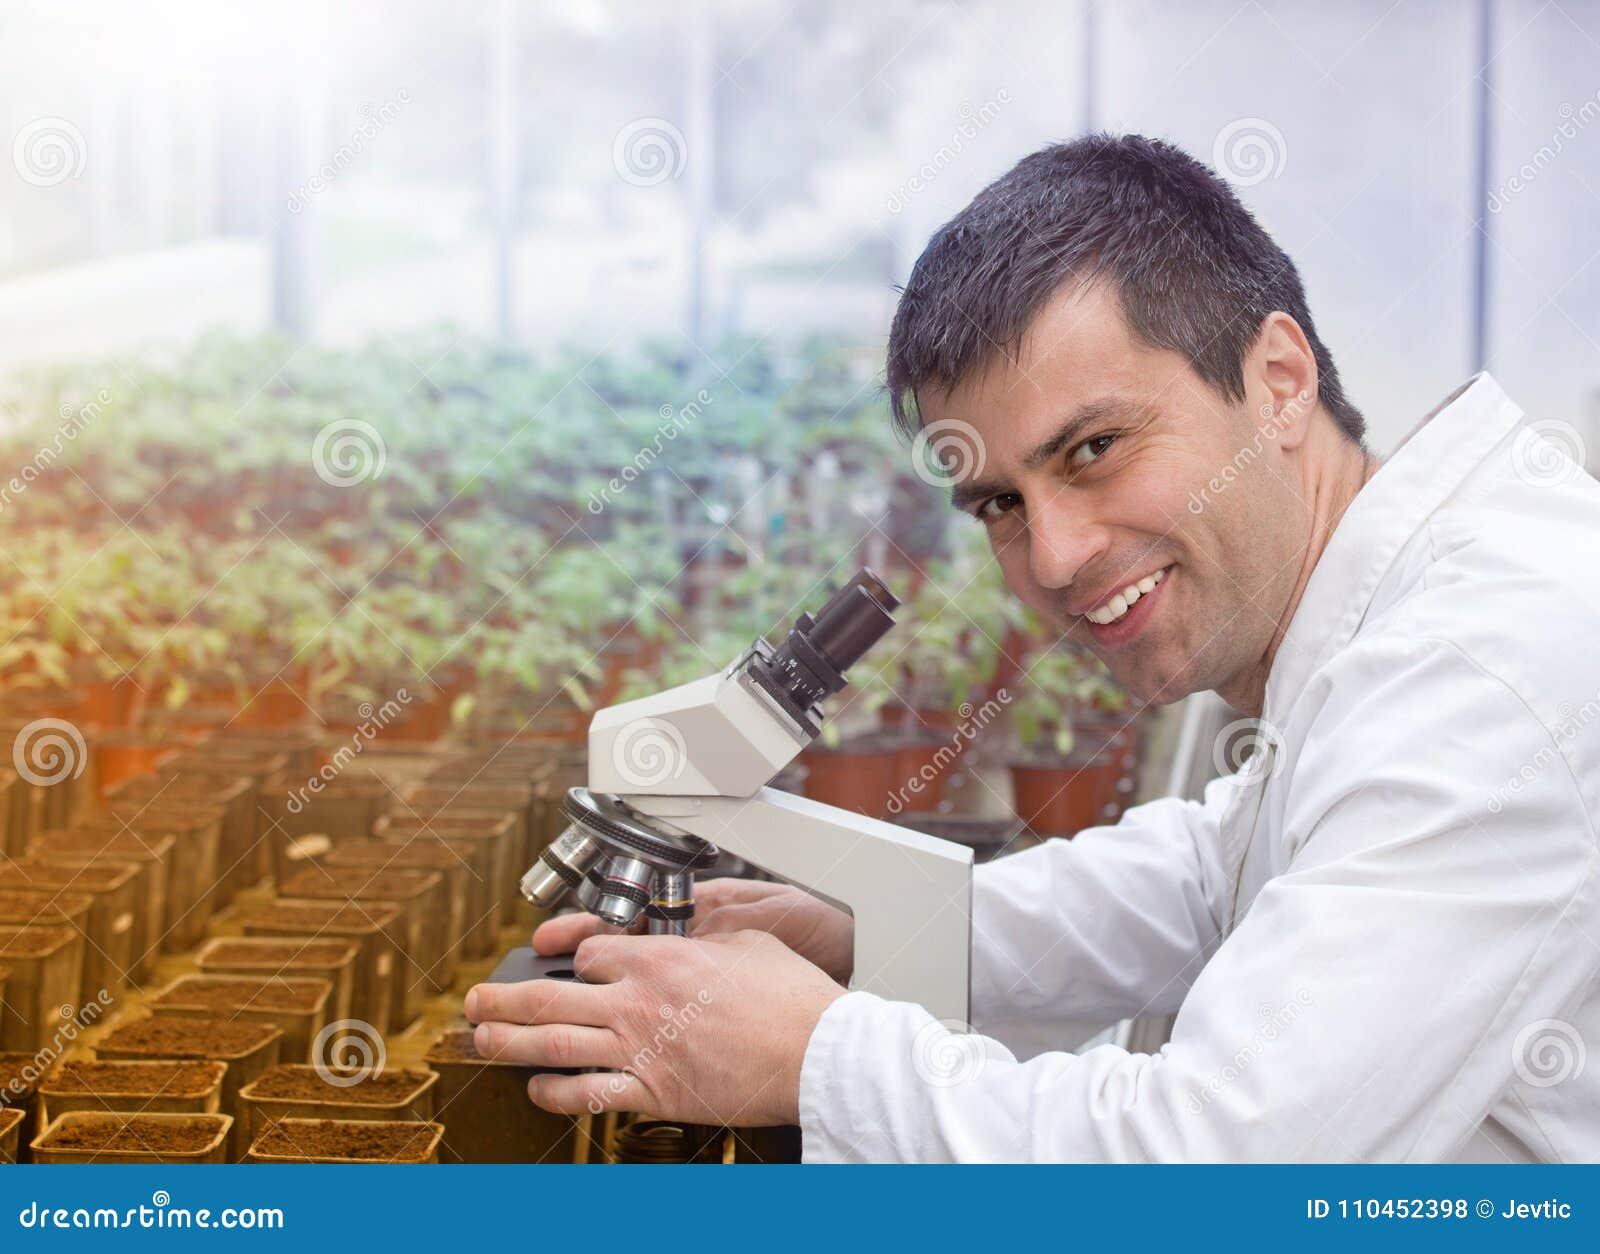 Forskare med mikroskopet i grönt hus